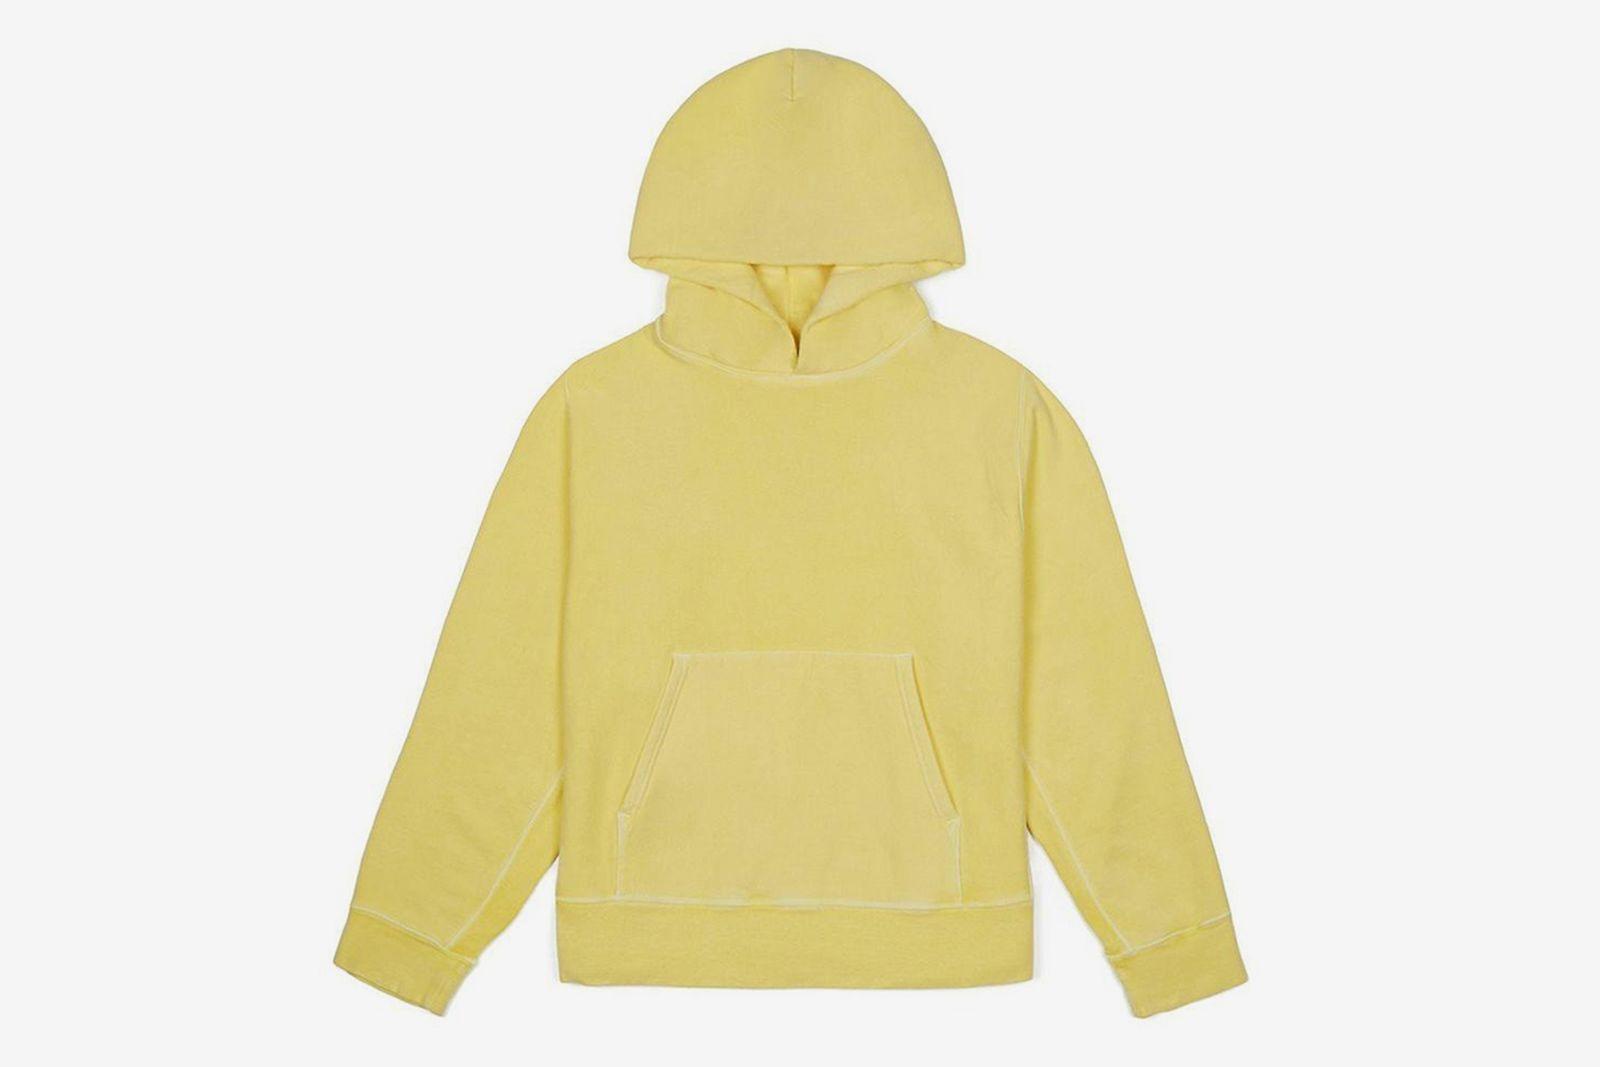 yeezy supply restocked reduced hoodies